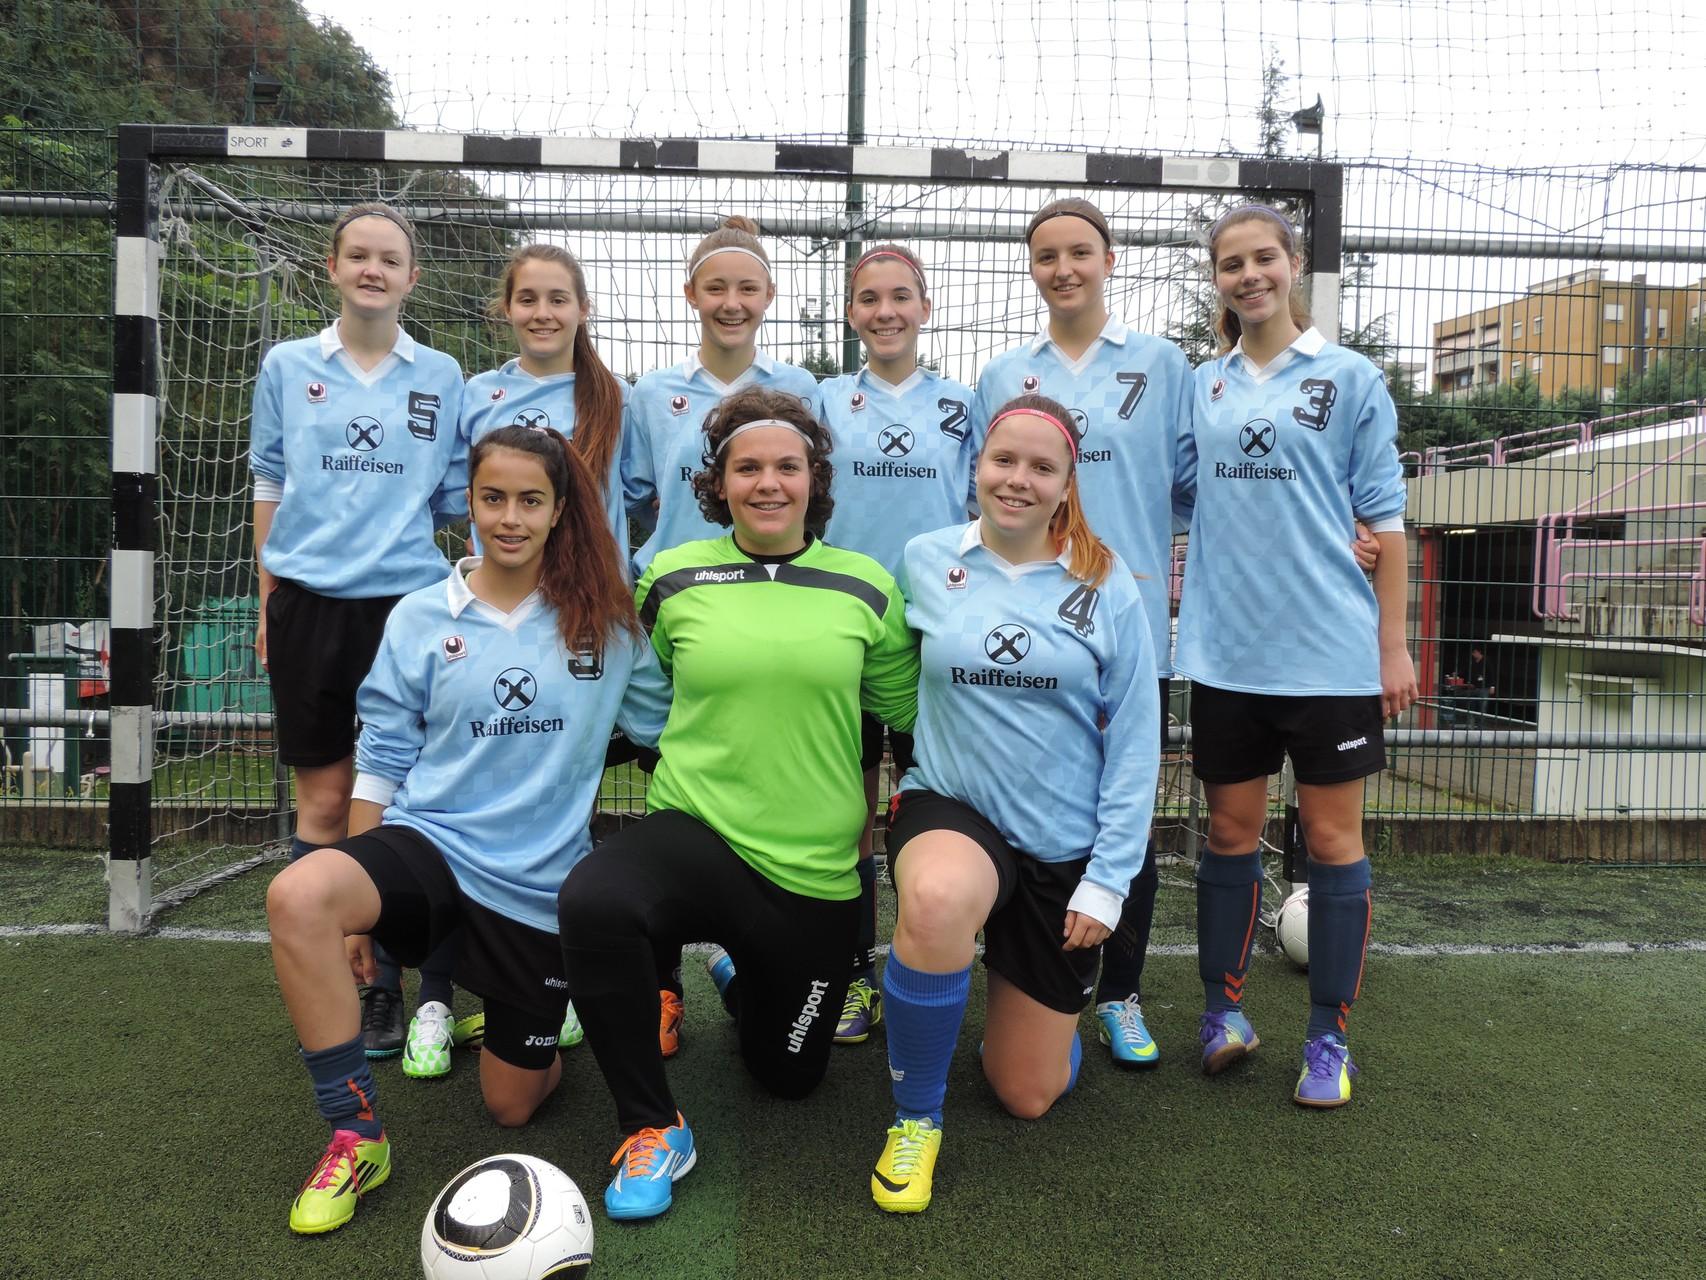 im Bild: Lisa, Flutra, Melli, Chrissi, Laura, Magdalena, Sara, Sonja, Kathi